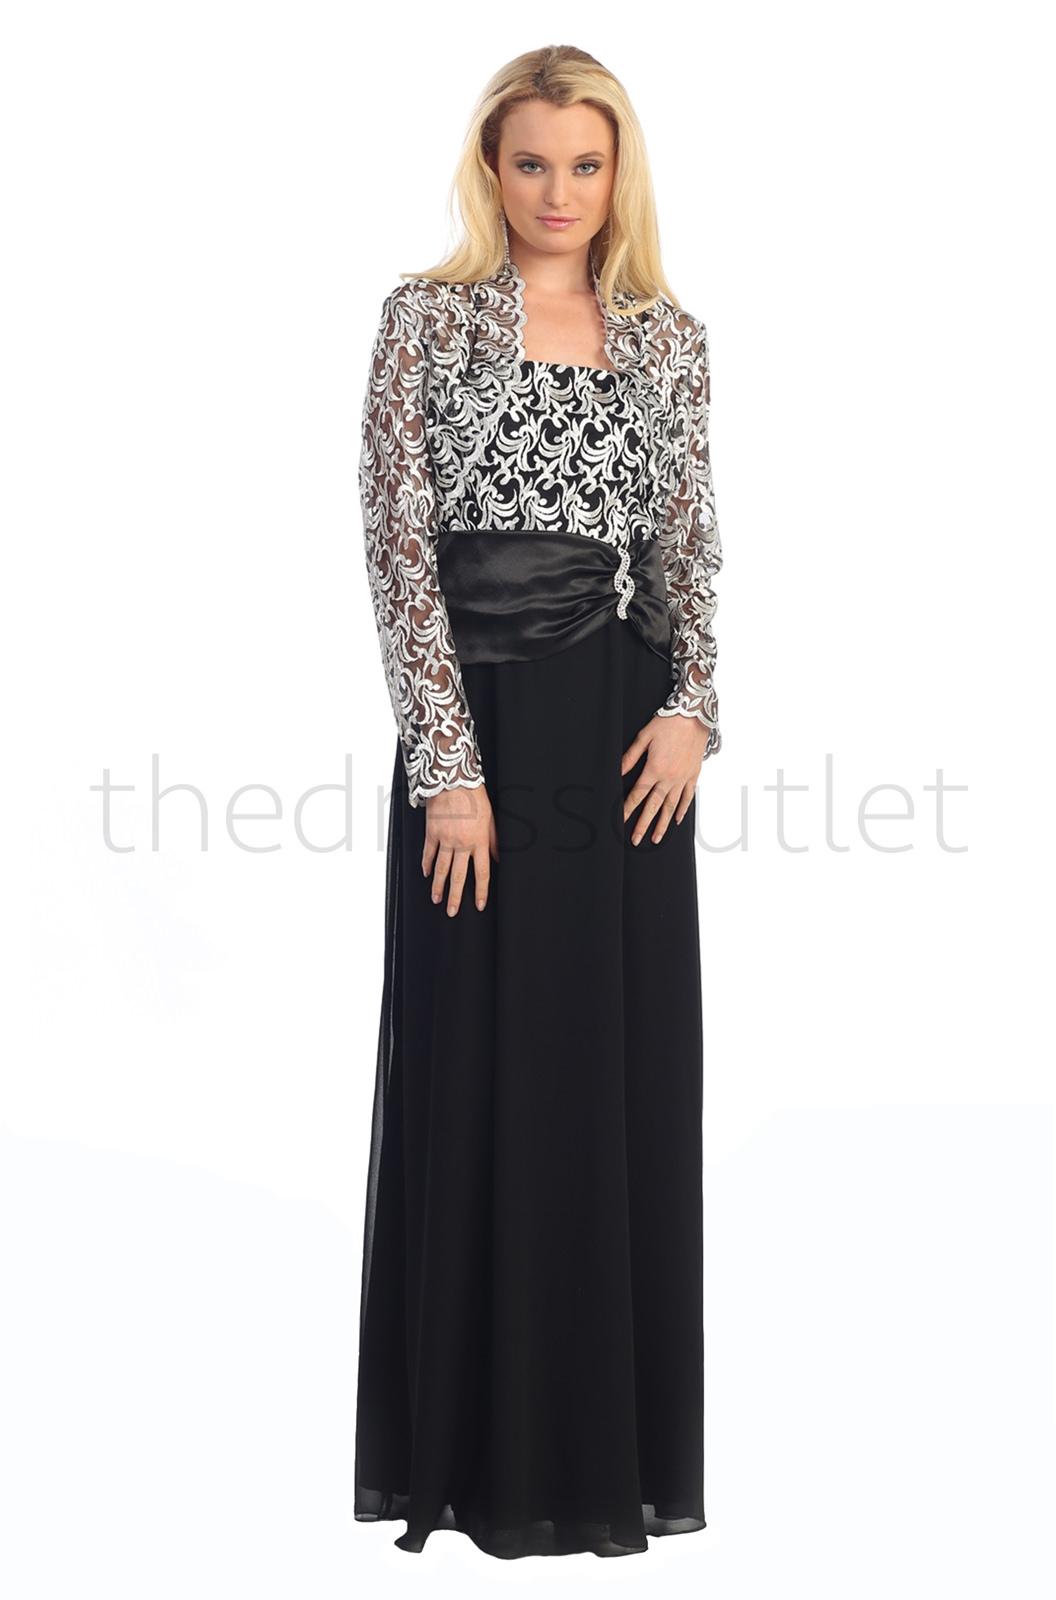 Black tie event dresses plus size - woltermanortho.com